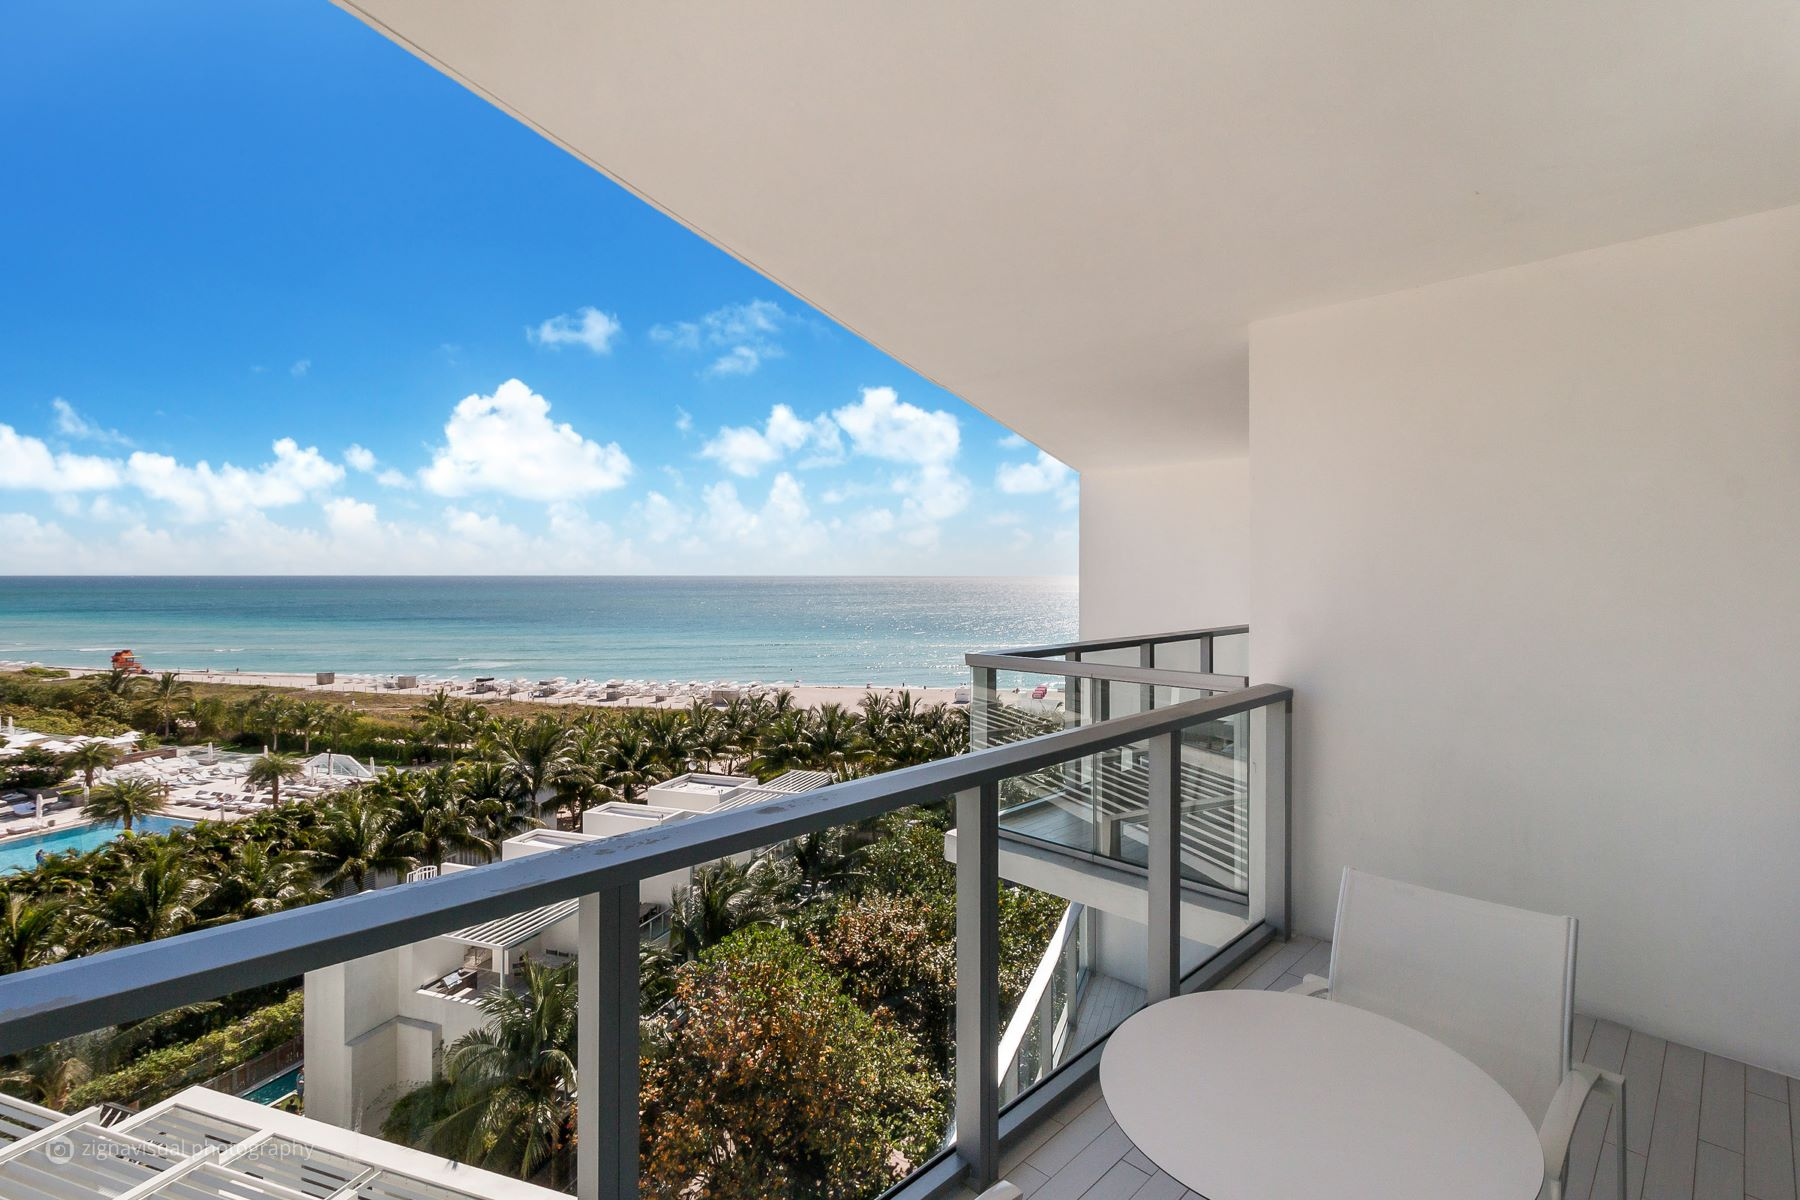 Condominium for Sale at 2201 Collins Ave 2201 Collins Ave 815, Miami Beach, Florida, 33139 United States